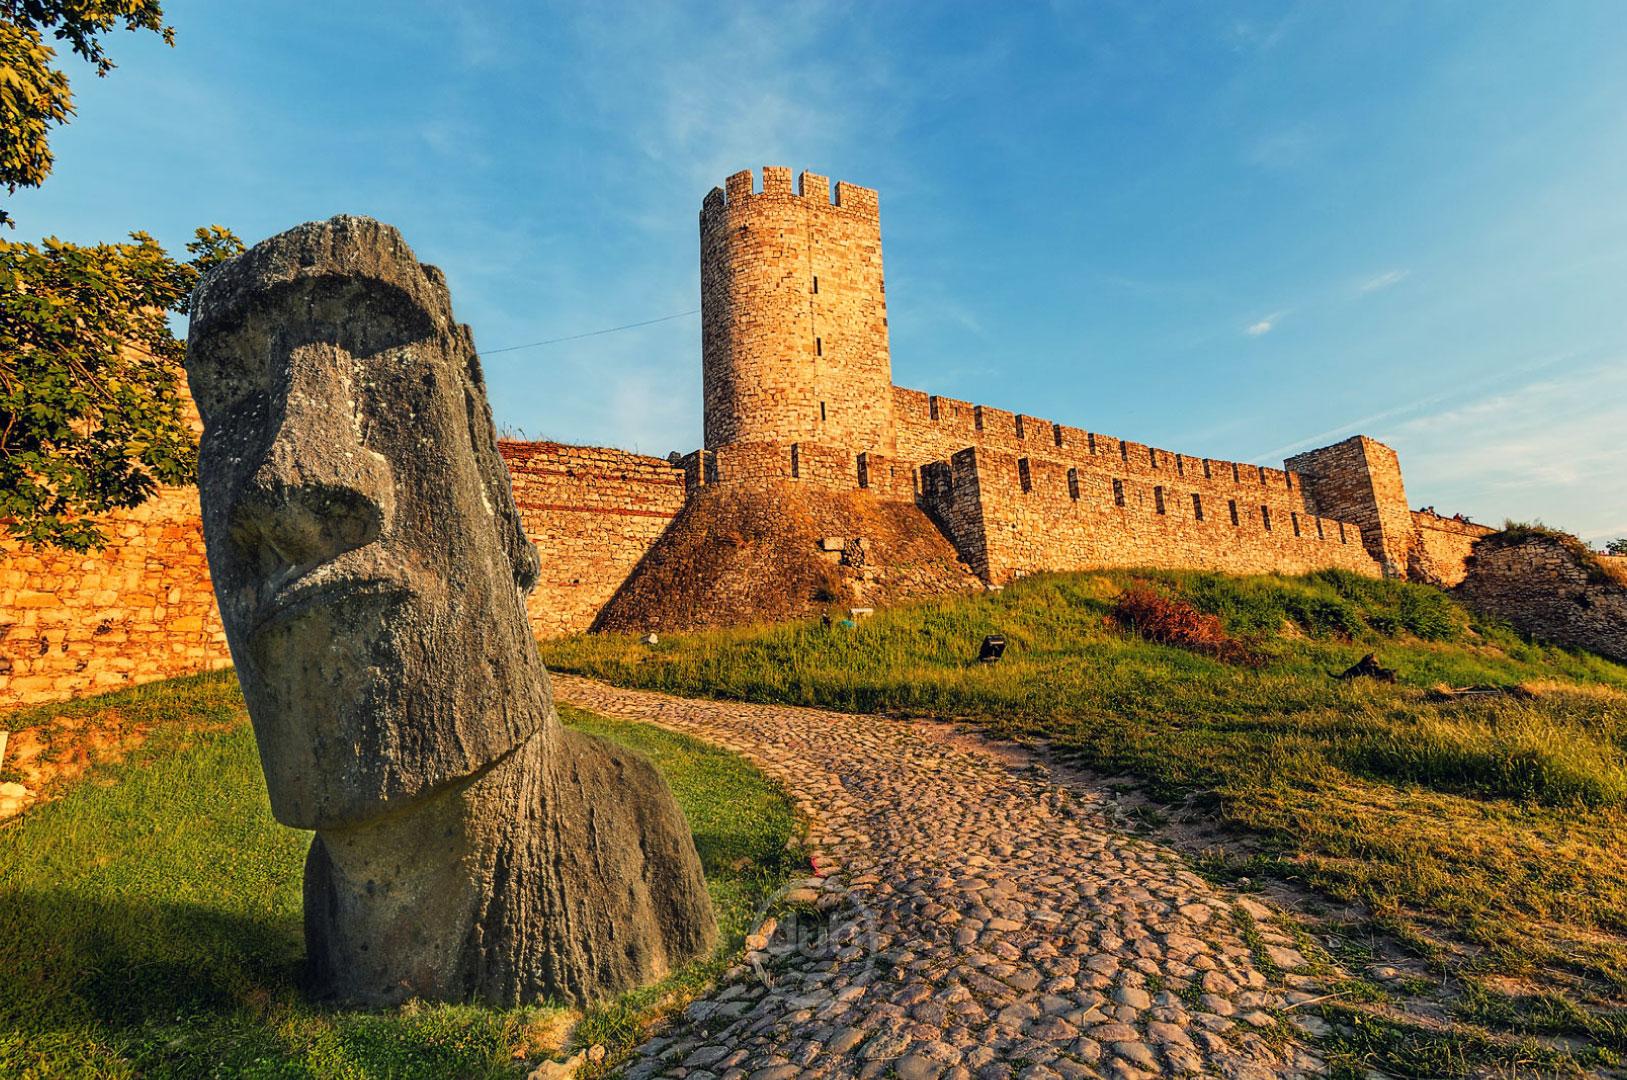 ŠBBKBB: Svetske atrakcije u Beogradu - Mali Milivoje (foto: Shutterstock; montaža: Miloš Tripković)